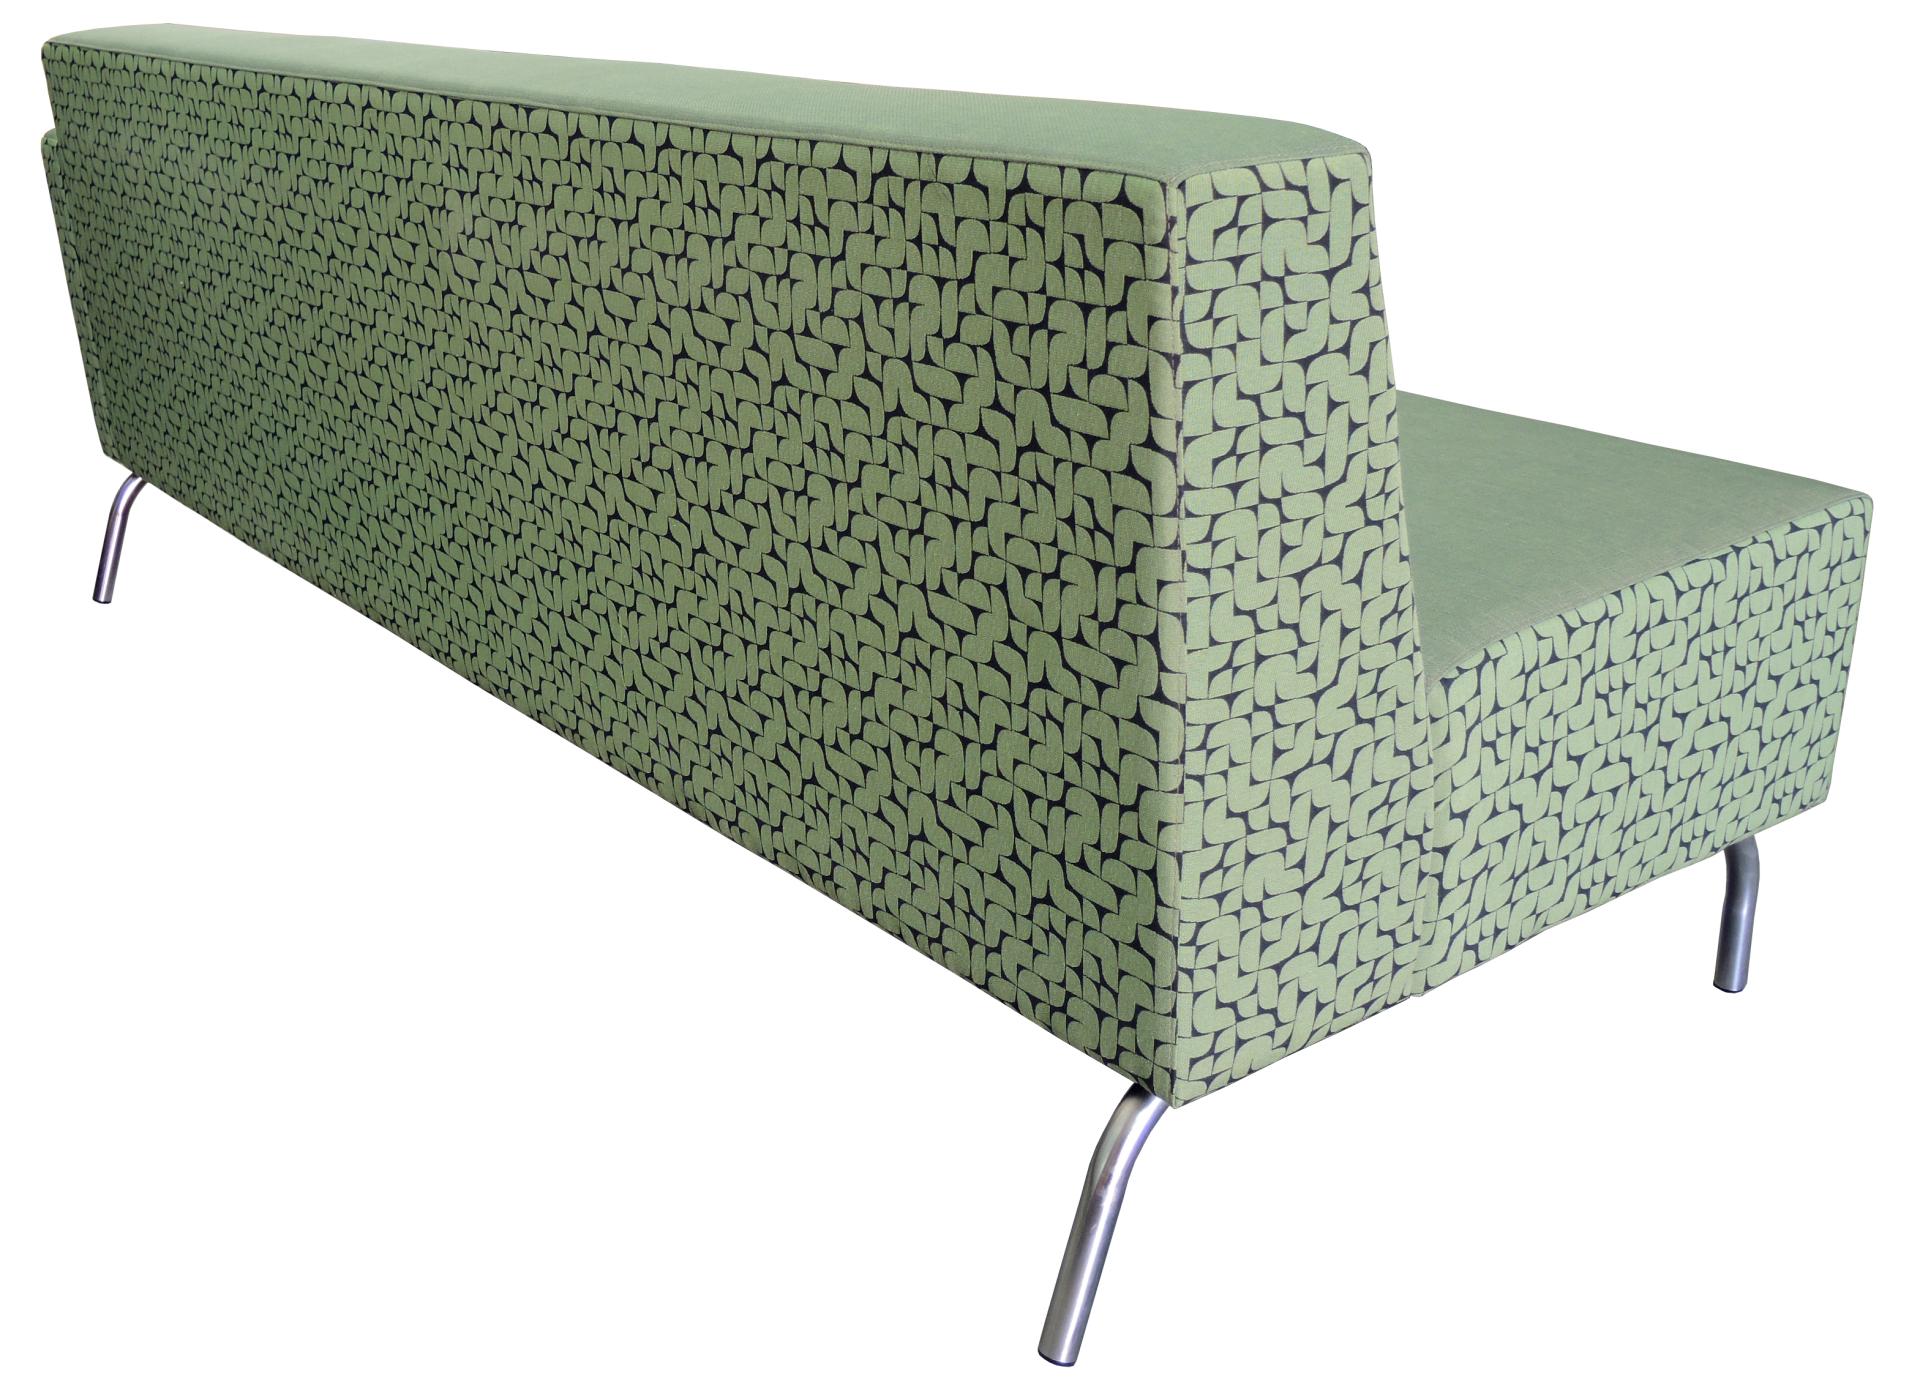 Direct Ergonomics | Sydney Office Furniture | Ergonomic Furniture | Collaborative Seating | Waiting Lounges | Waiting Room Seating | Ergonomic Seating | LESA